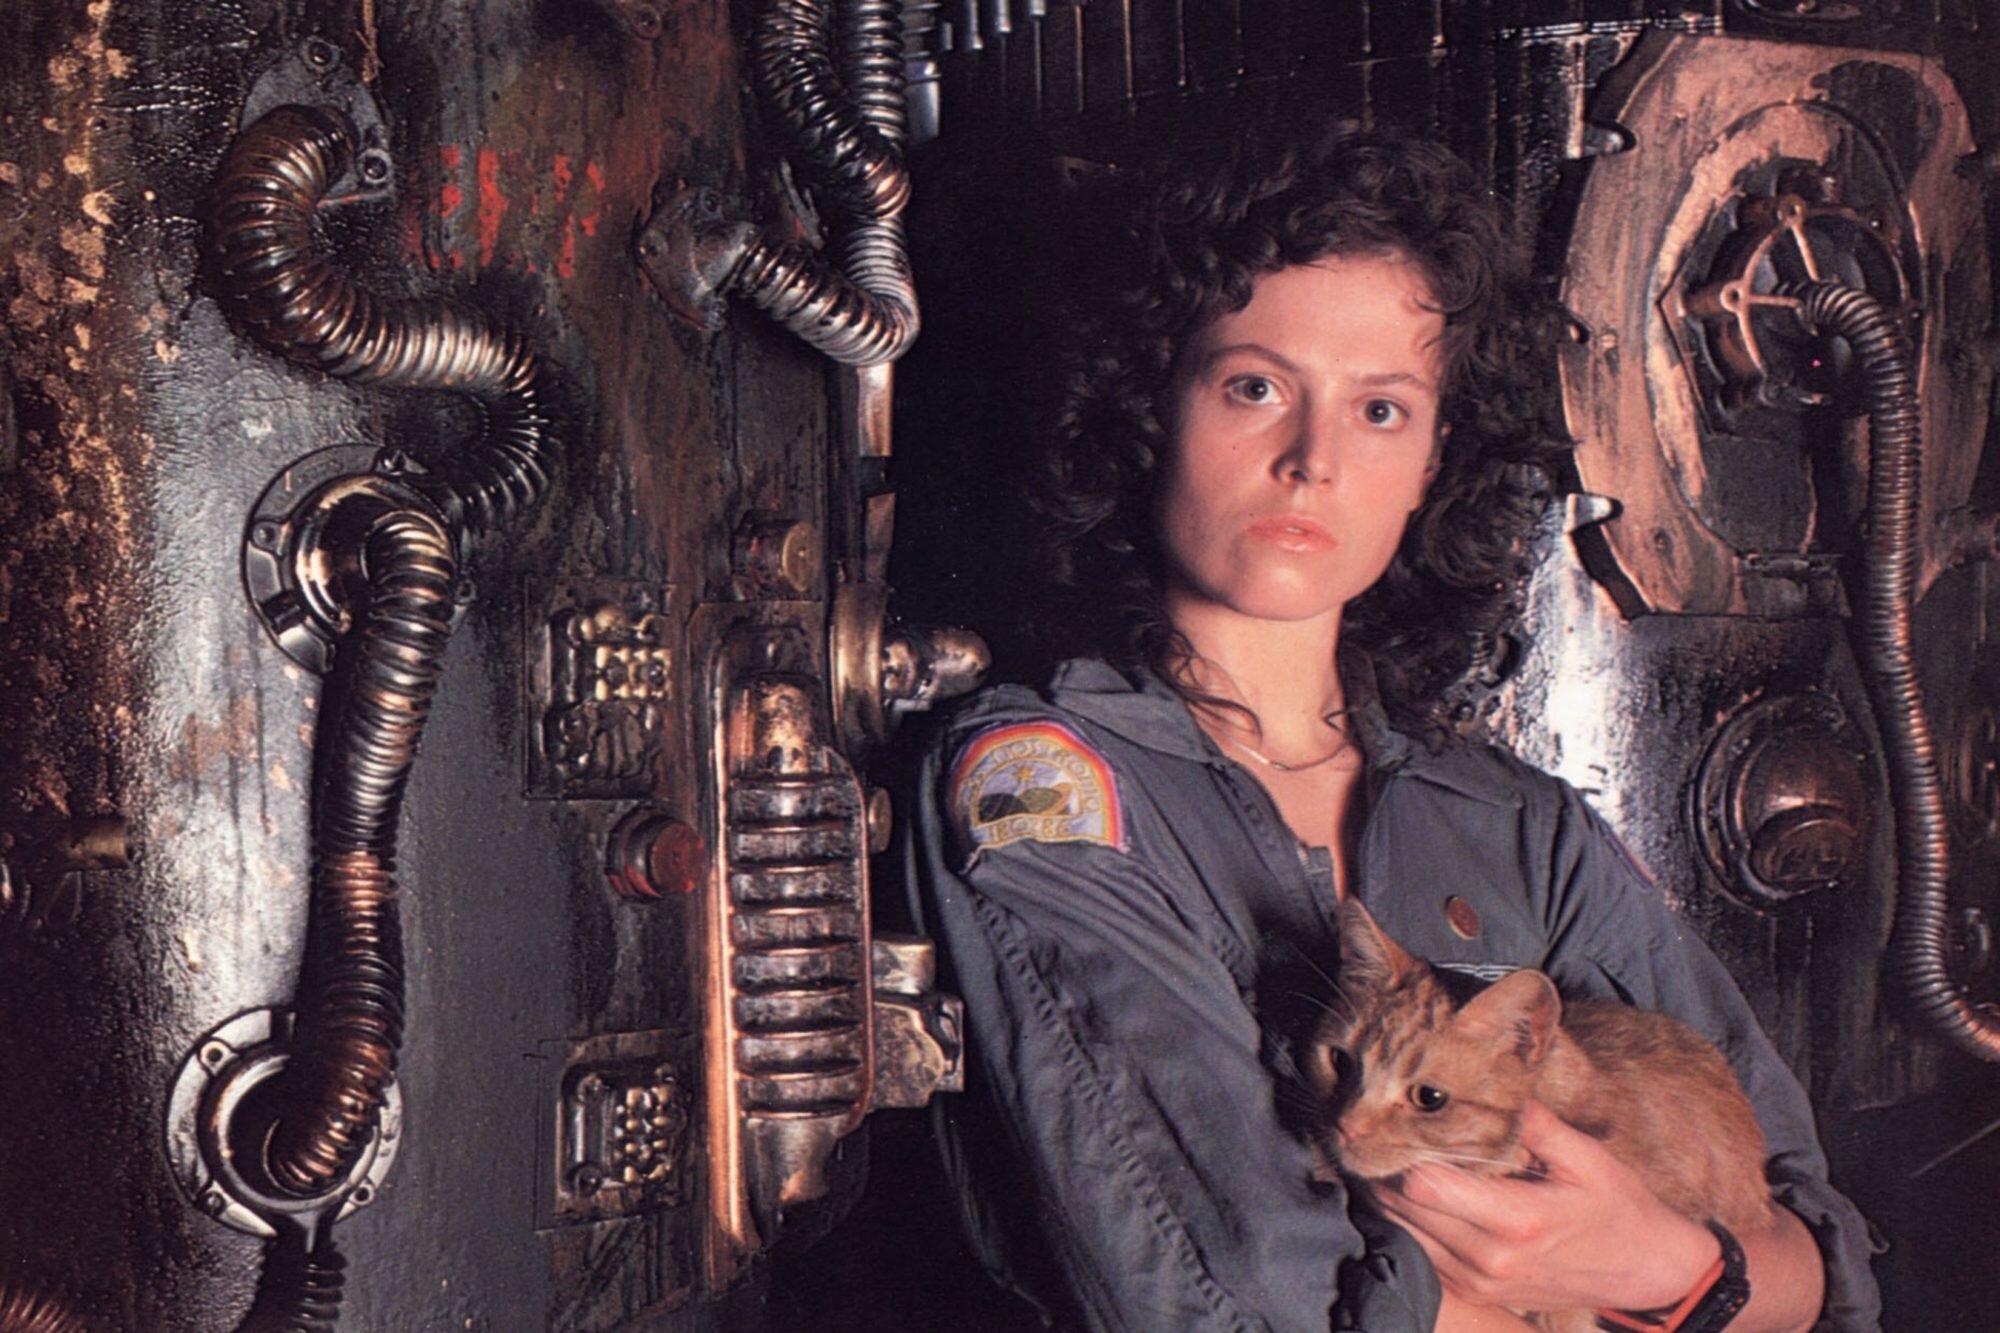 Sigourney Weaver talks 'Alien' legacy, sci-fi heroines | EW.com